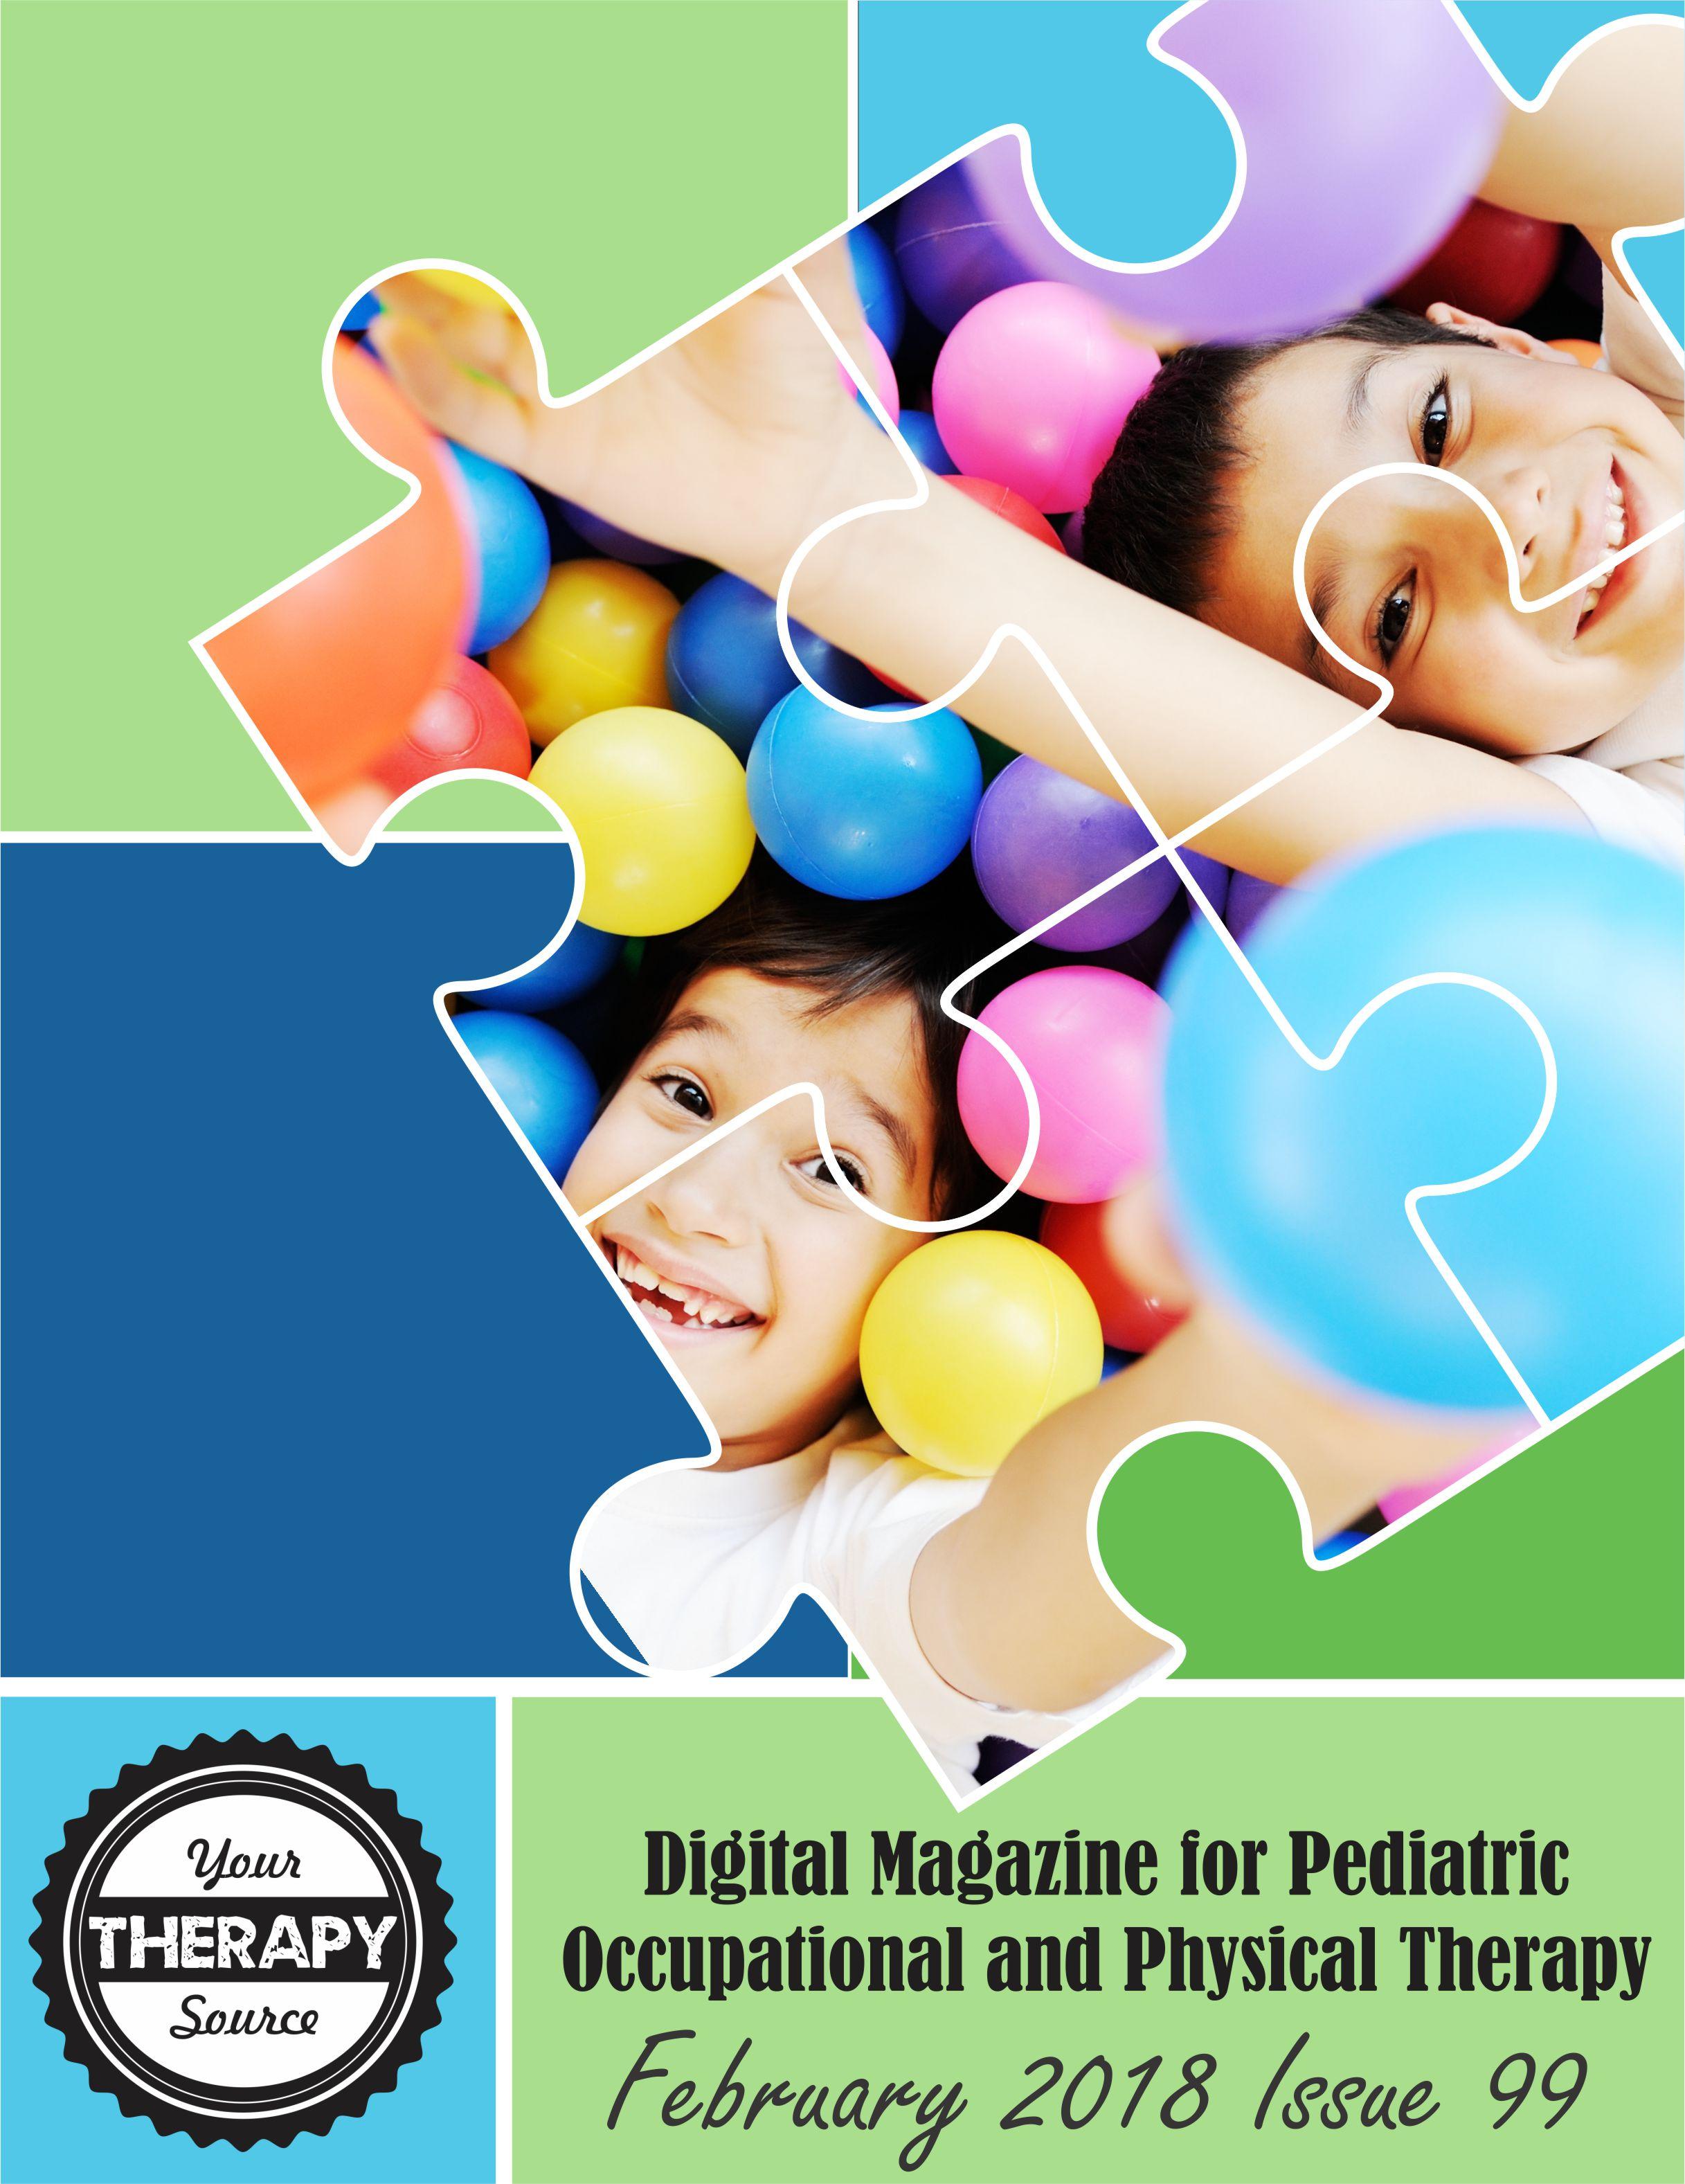 February Digital Magazine for Pediatric OTs and PTs